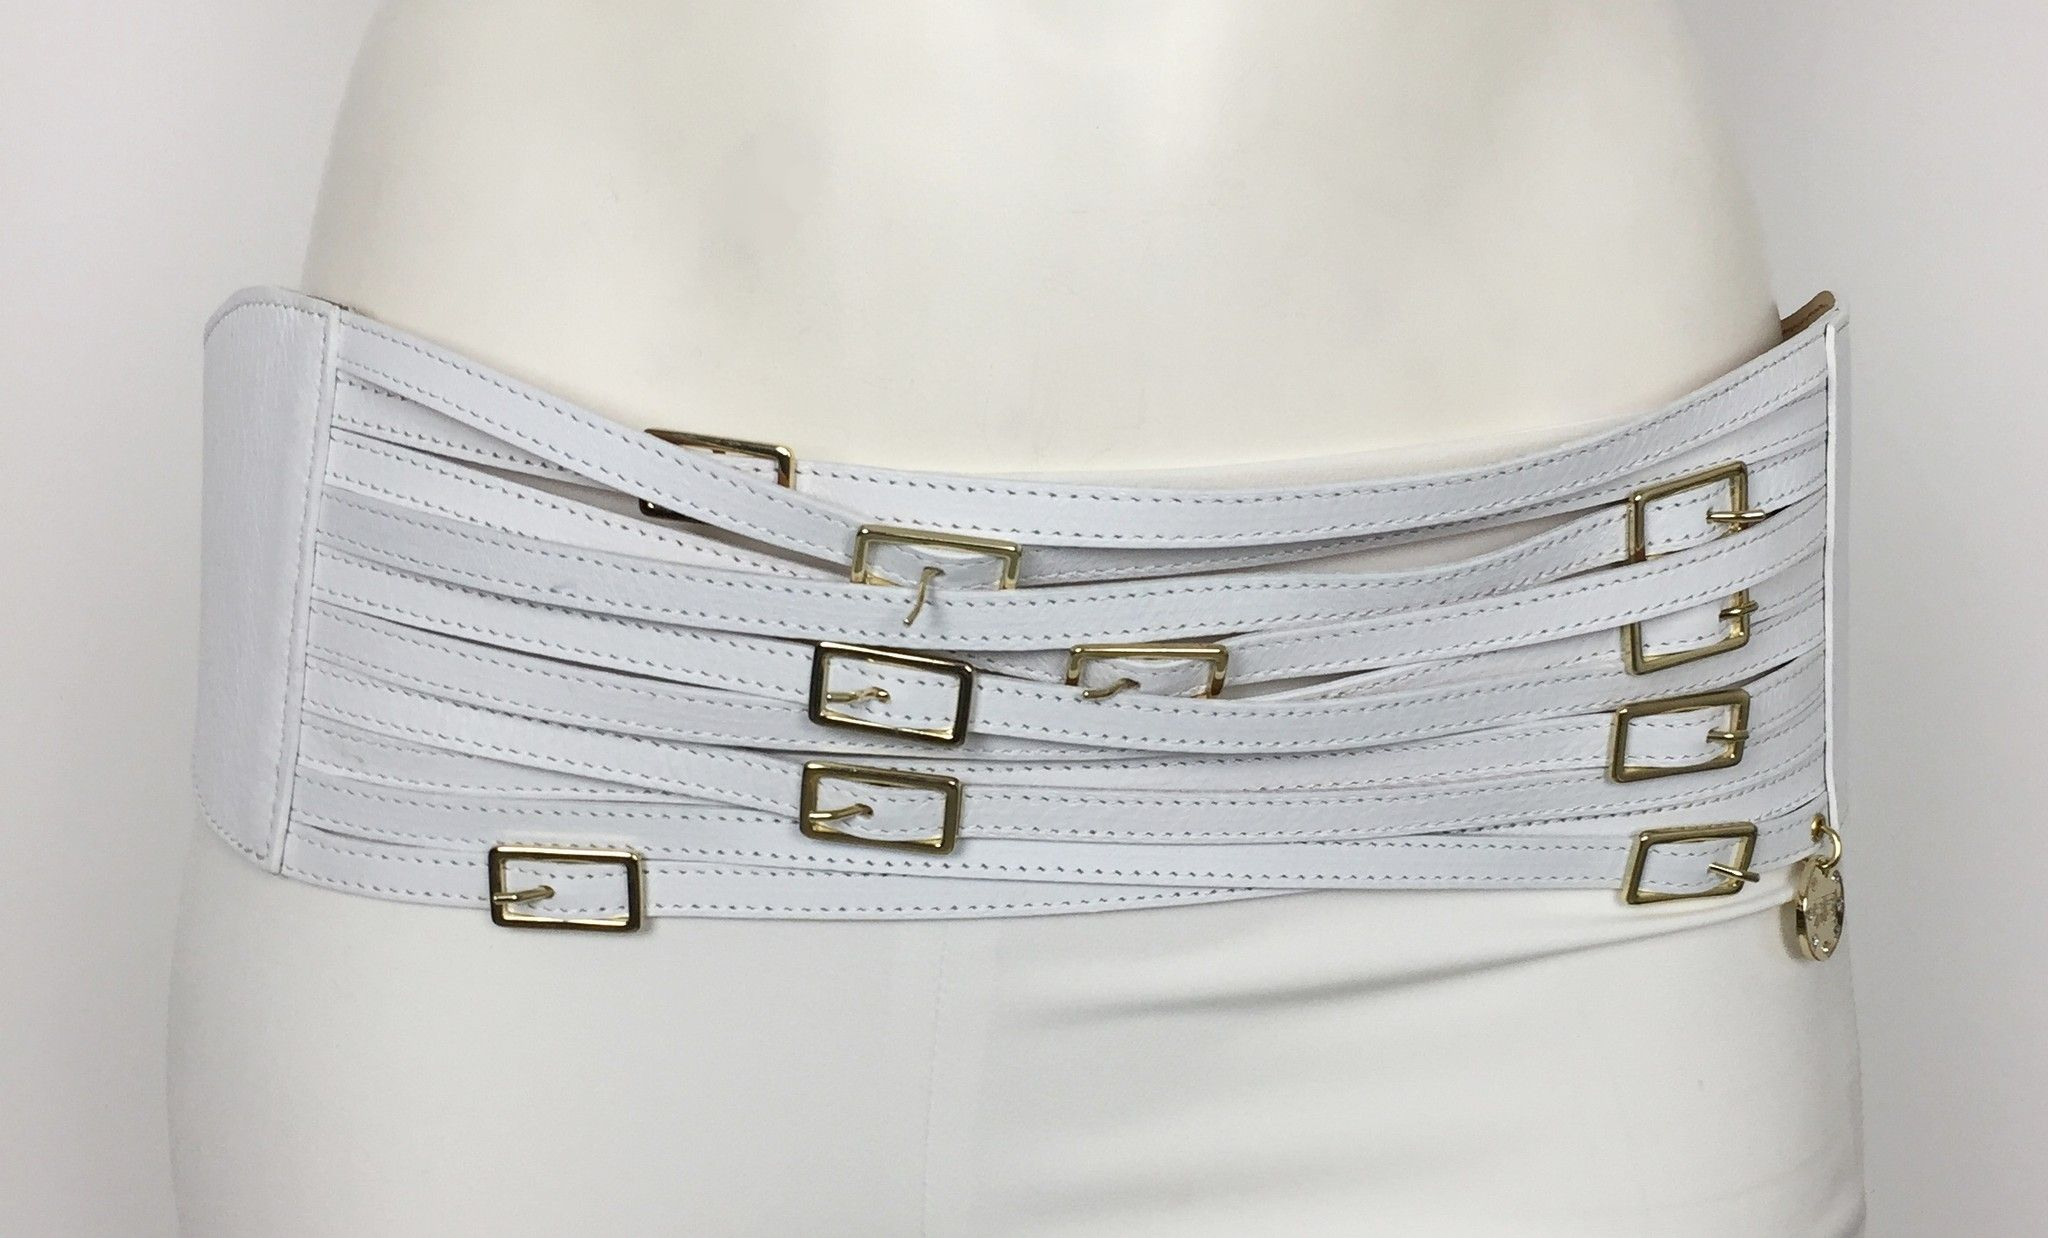 Cintura Roberta Biagi Alta Multi Fibbia con Finiture Dorate Cod.02148